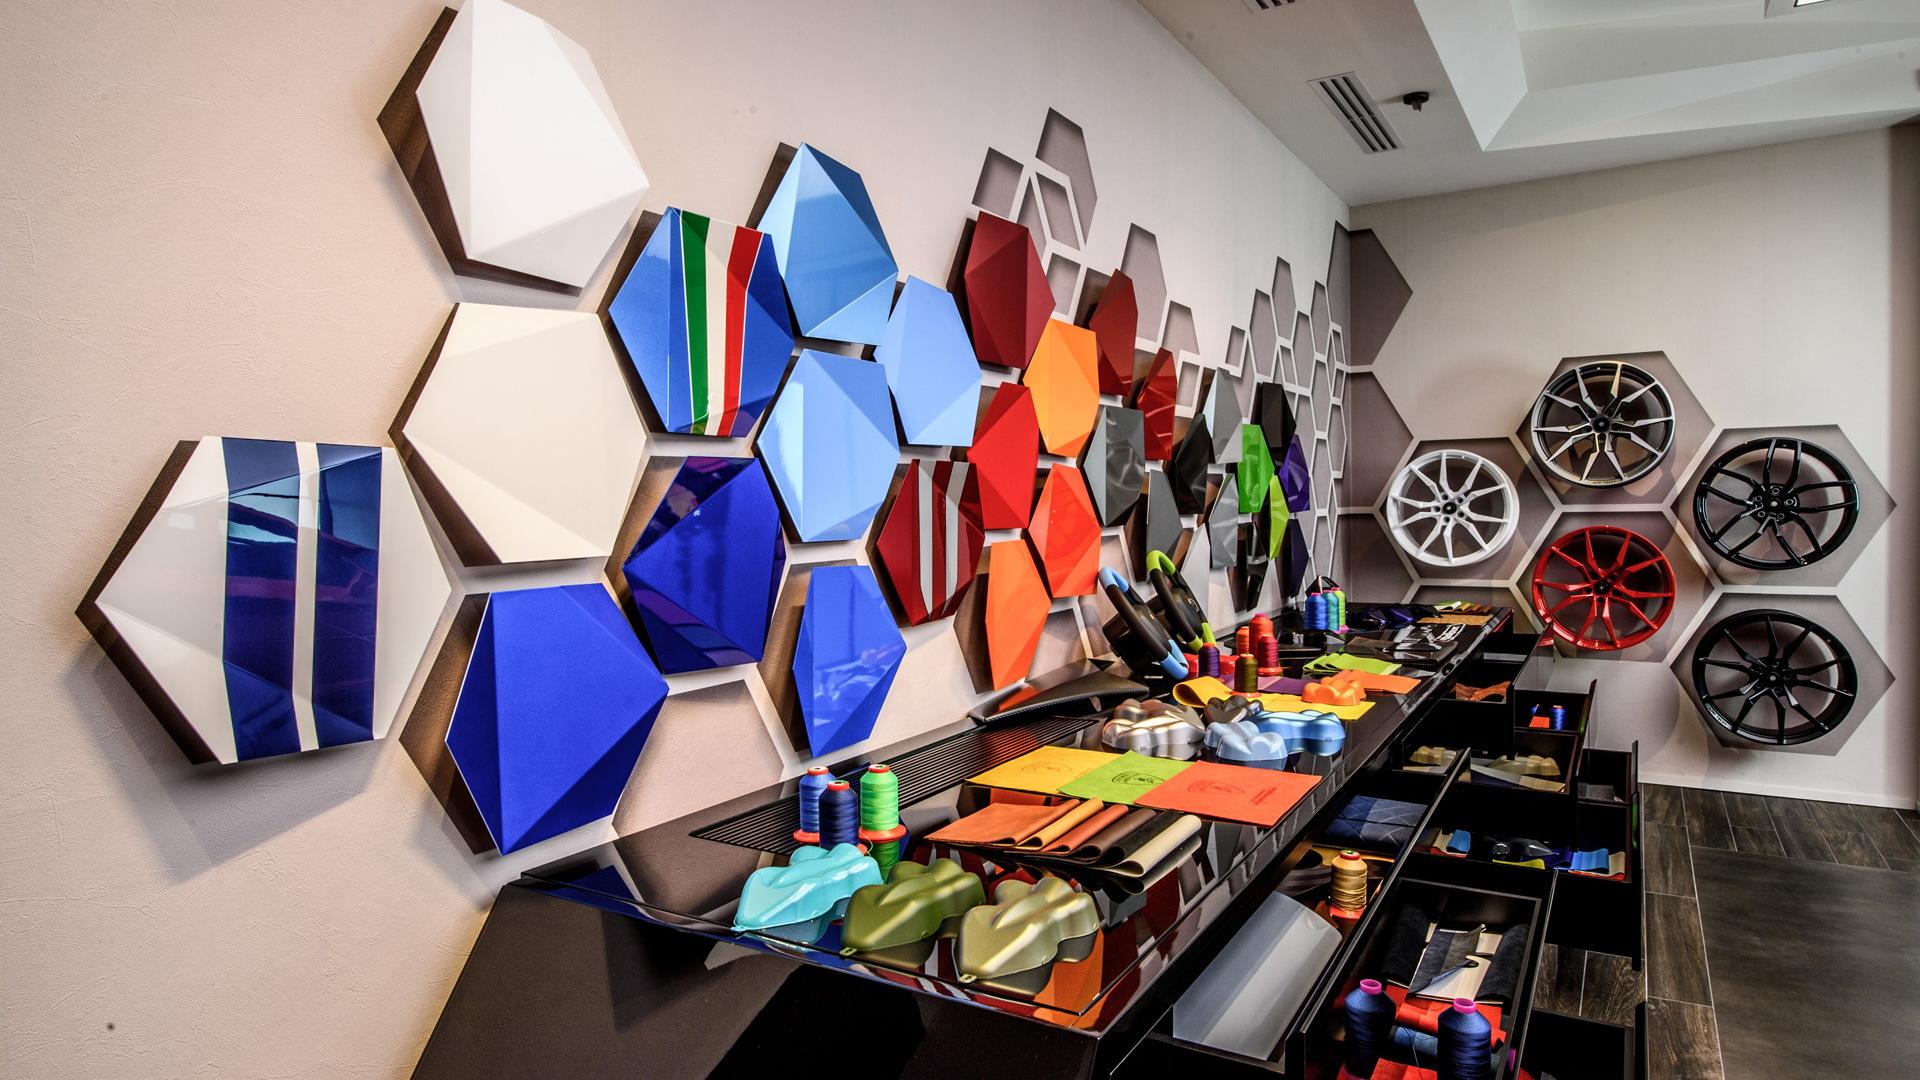 Lamborghini Ad Personam Studio in Sant'Agata Bolognese, Italy